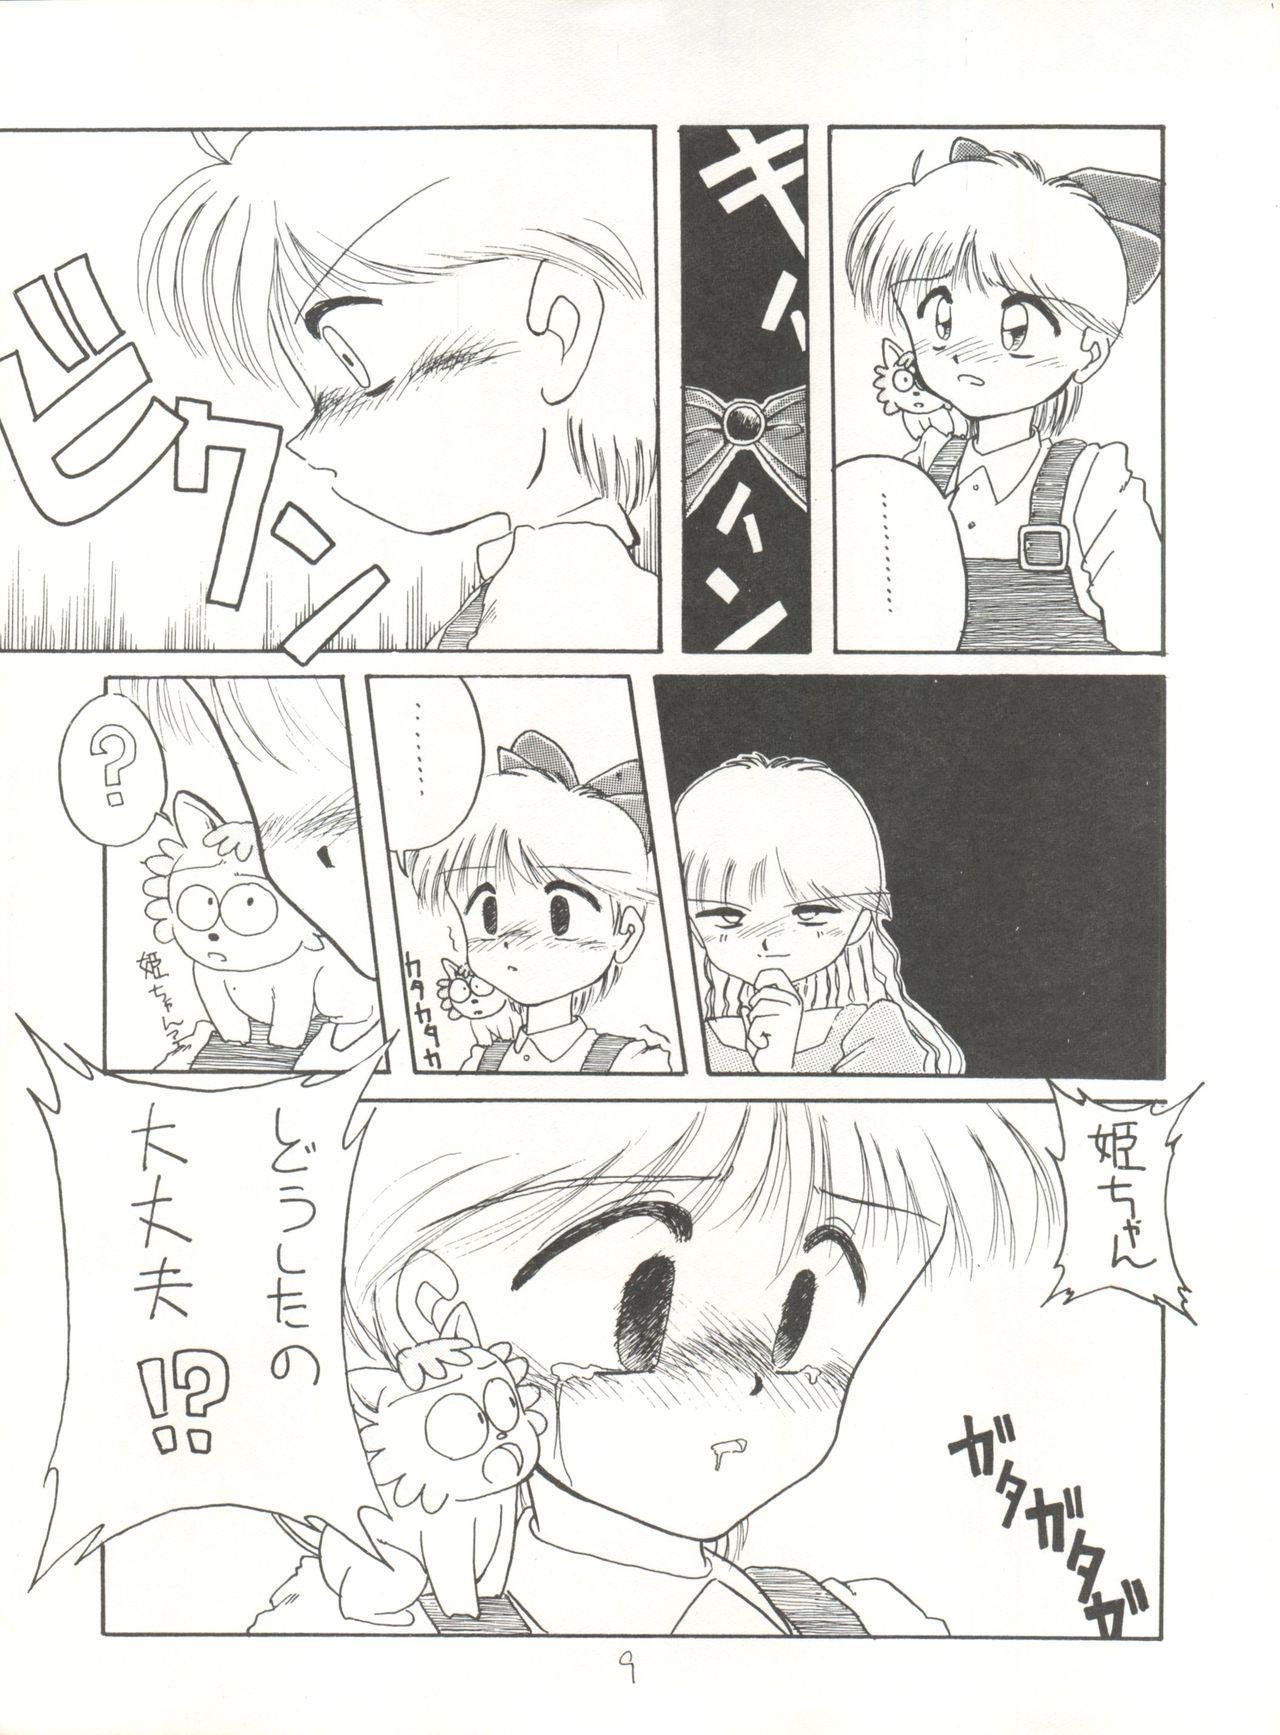 [Global One (MARO)] Sadistic 5 (Cutey Honey, Devilman, Sailor Moon), [Global One (MARO)] Sadistic (Dirty Pair, Fushigi no Umi no Nadia, Sailor Moon), [Studio Ikkatsumajin] .ribbon (Hime-chan's Ribbon) 132